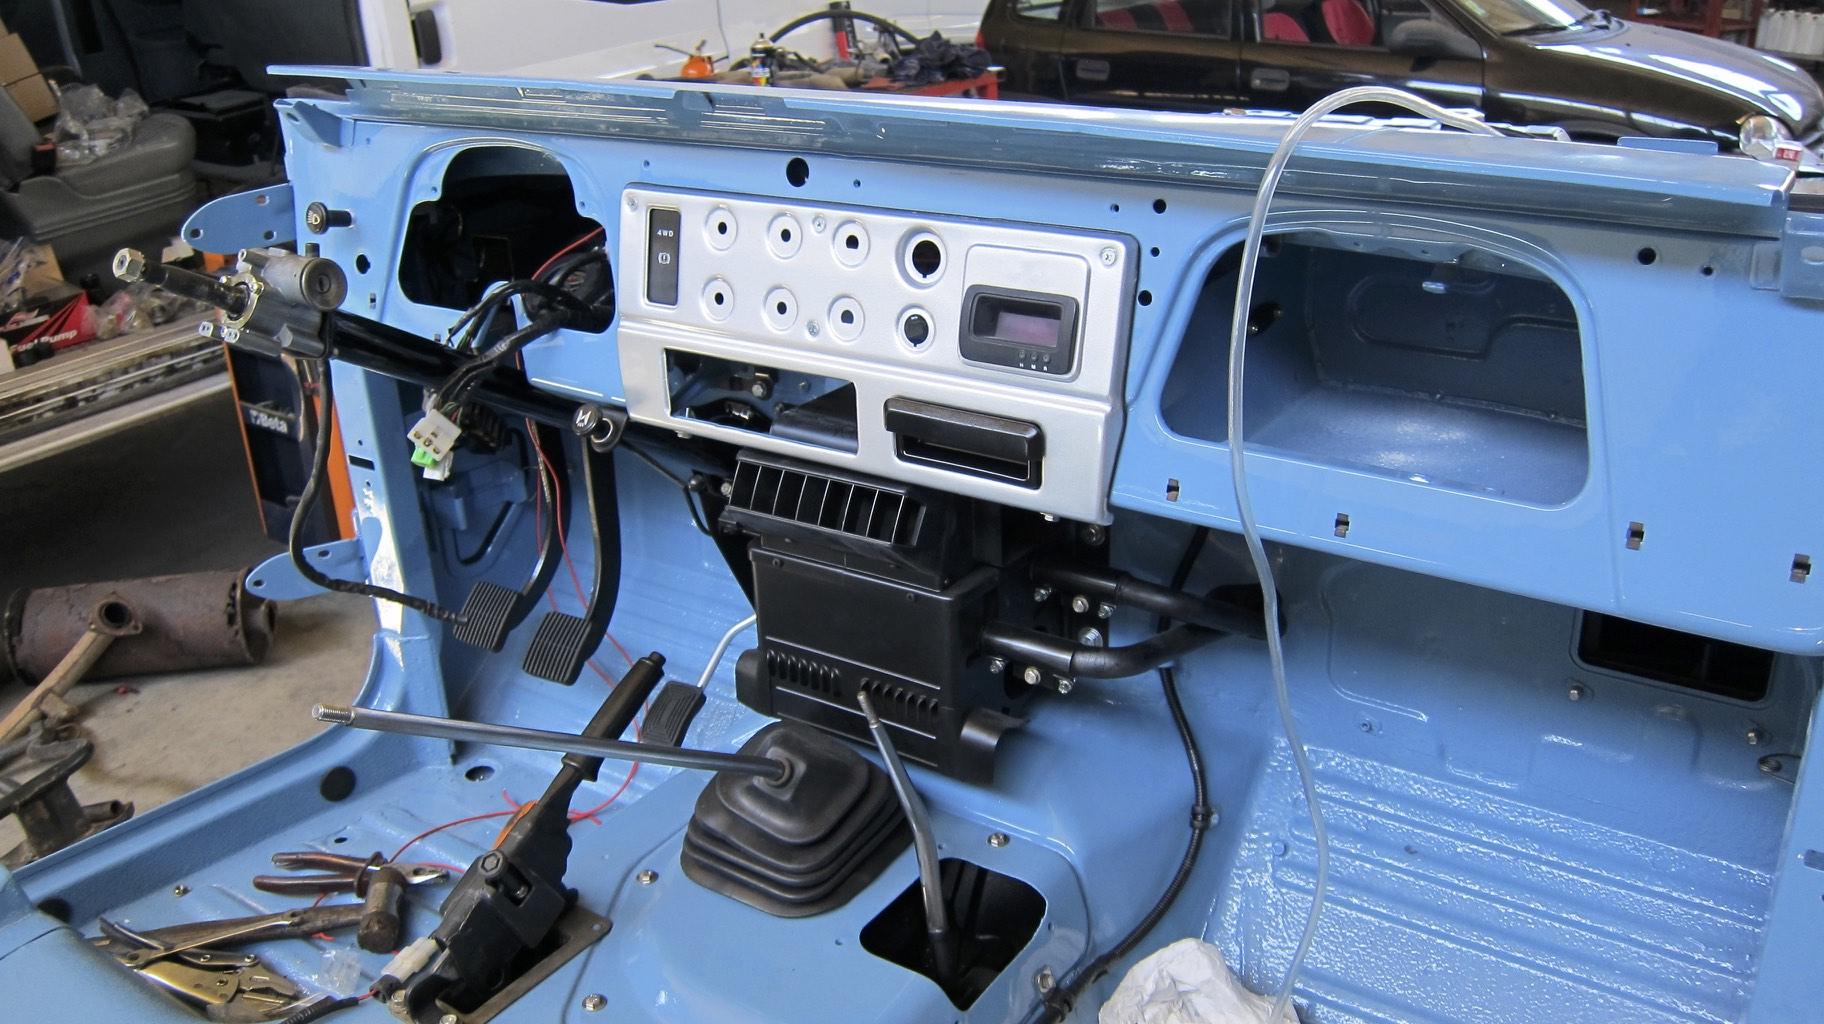 LegacyOverland_1980_ToyotaLandCruiser_FJ40_opentop_build_232.jpg